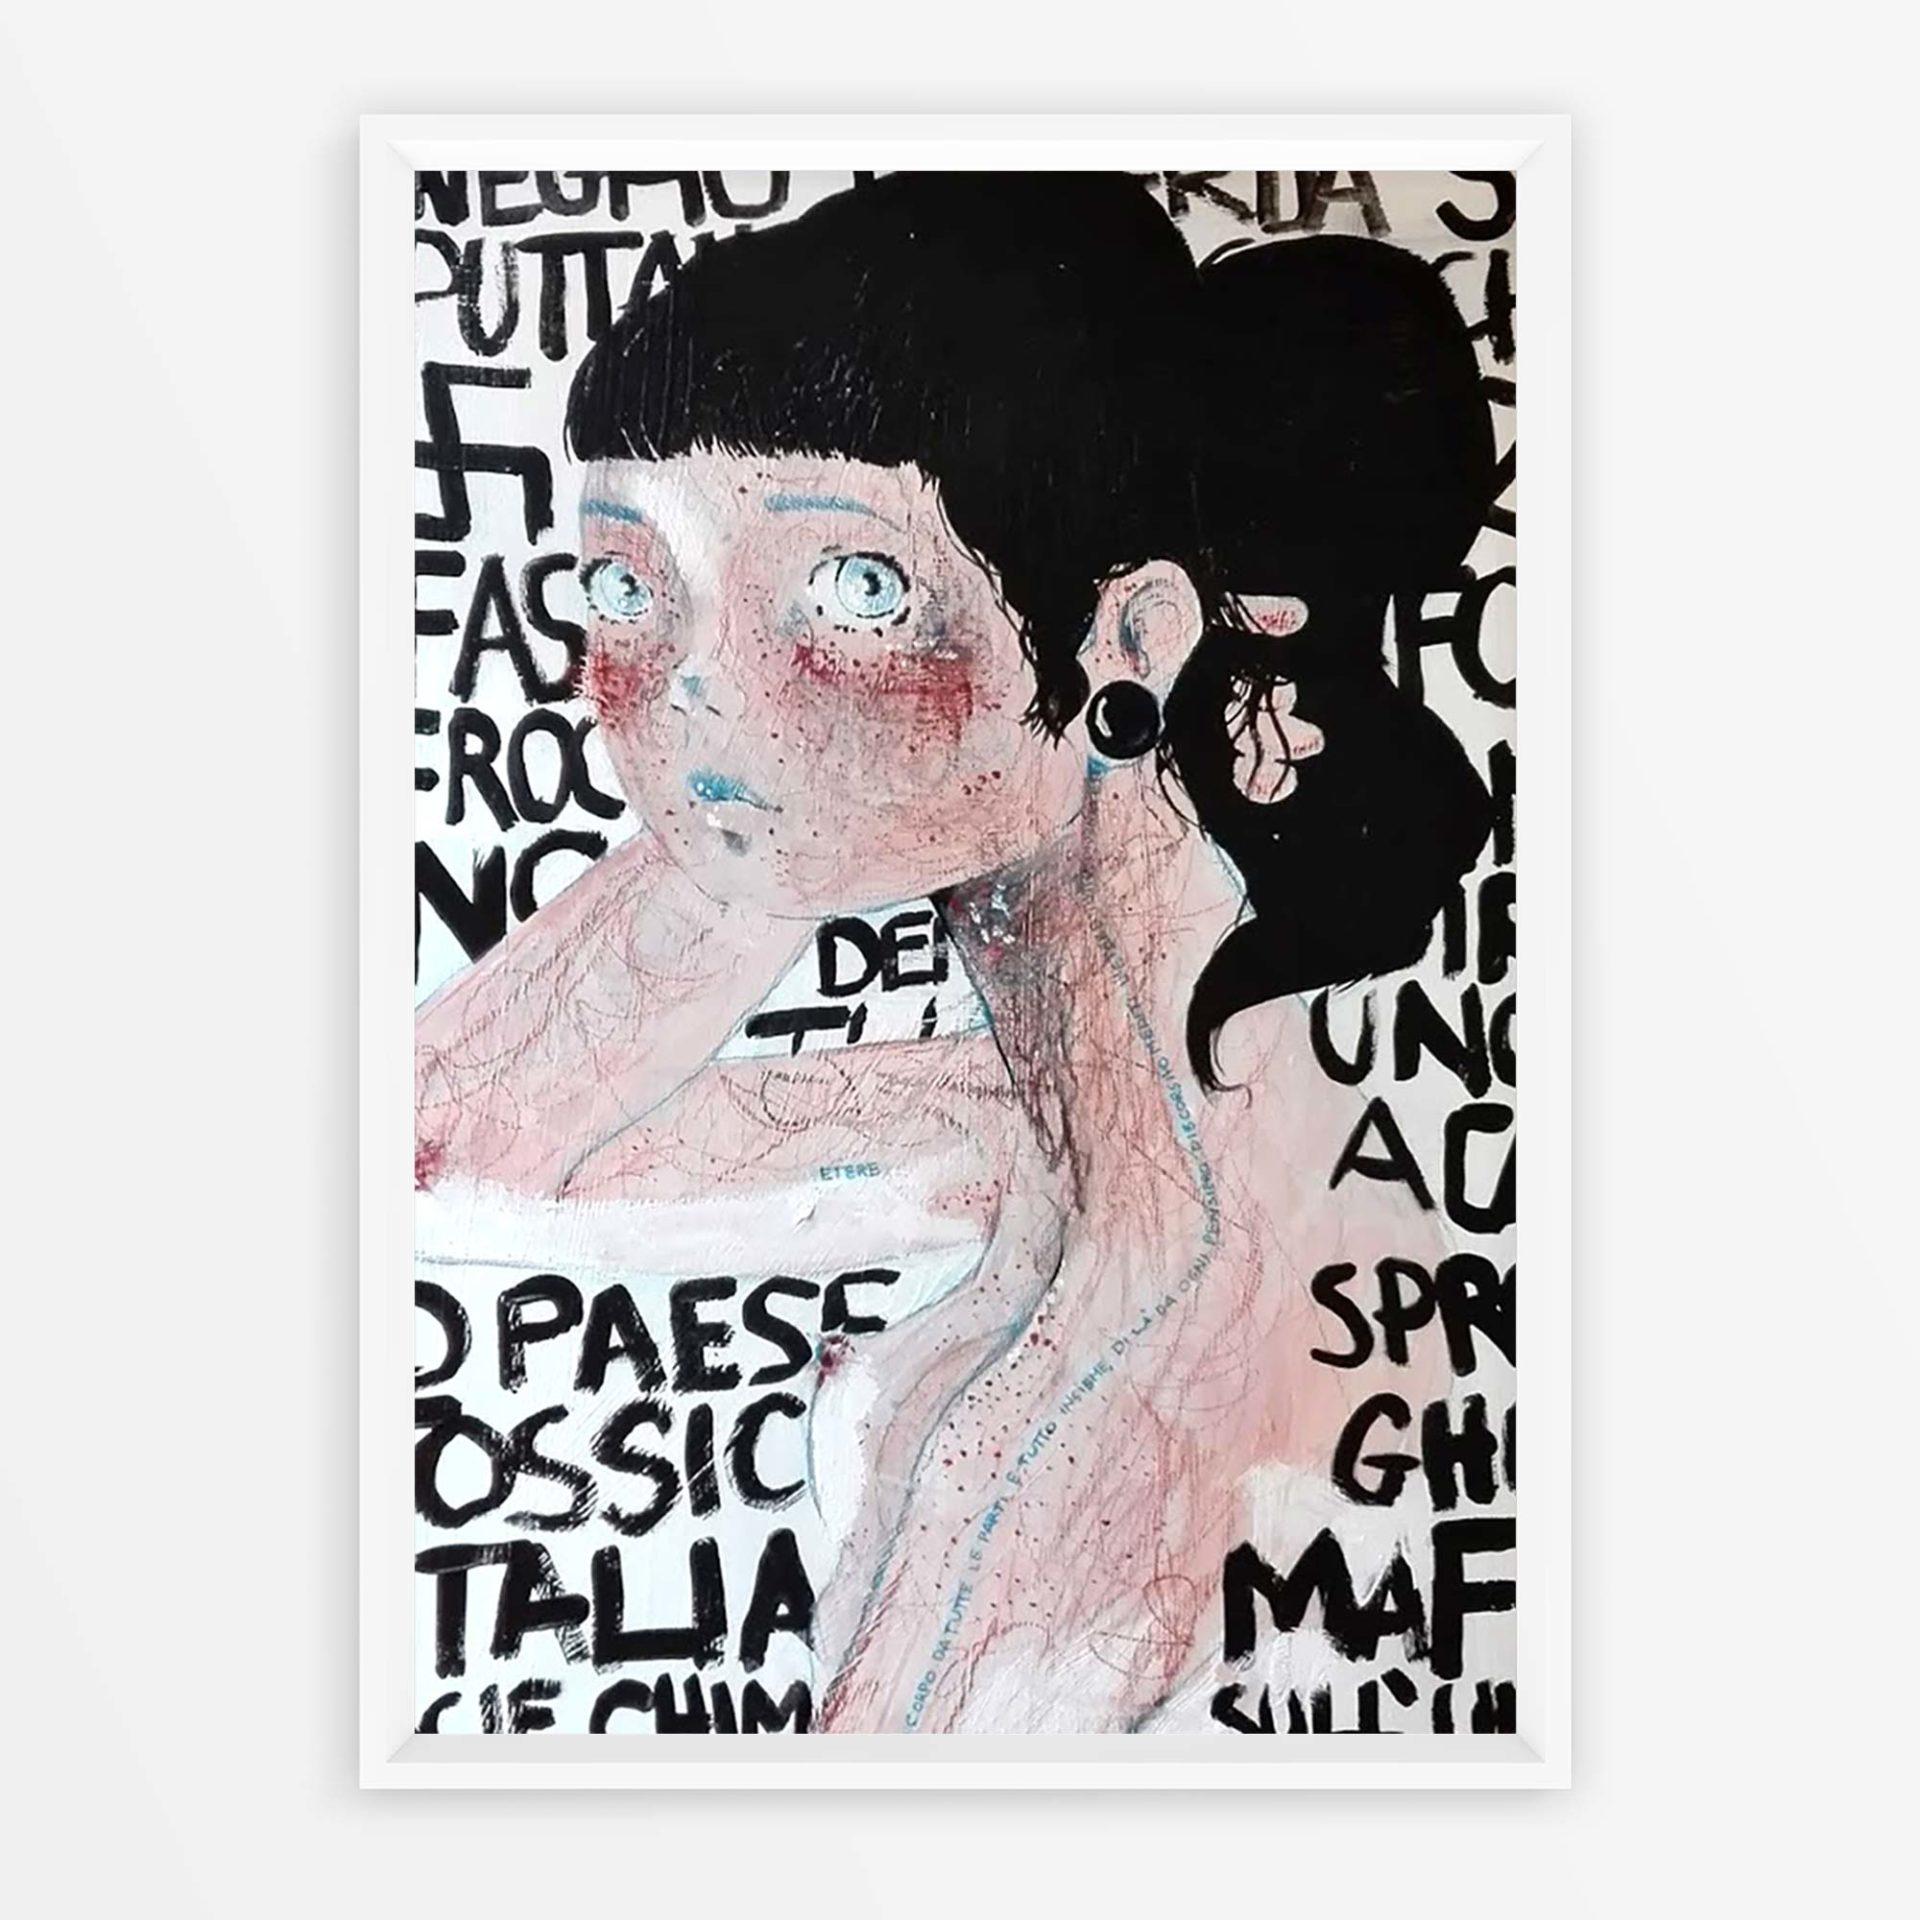 2018 Etere Pittura contemporanea Diego Gabriele